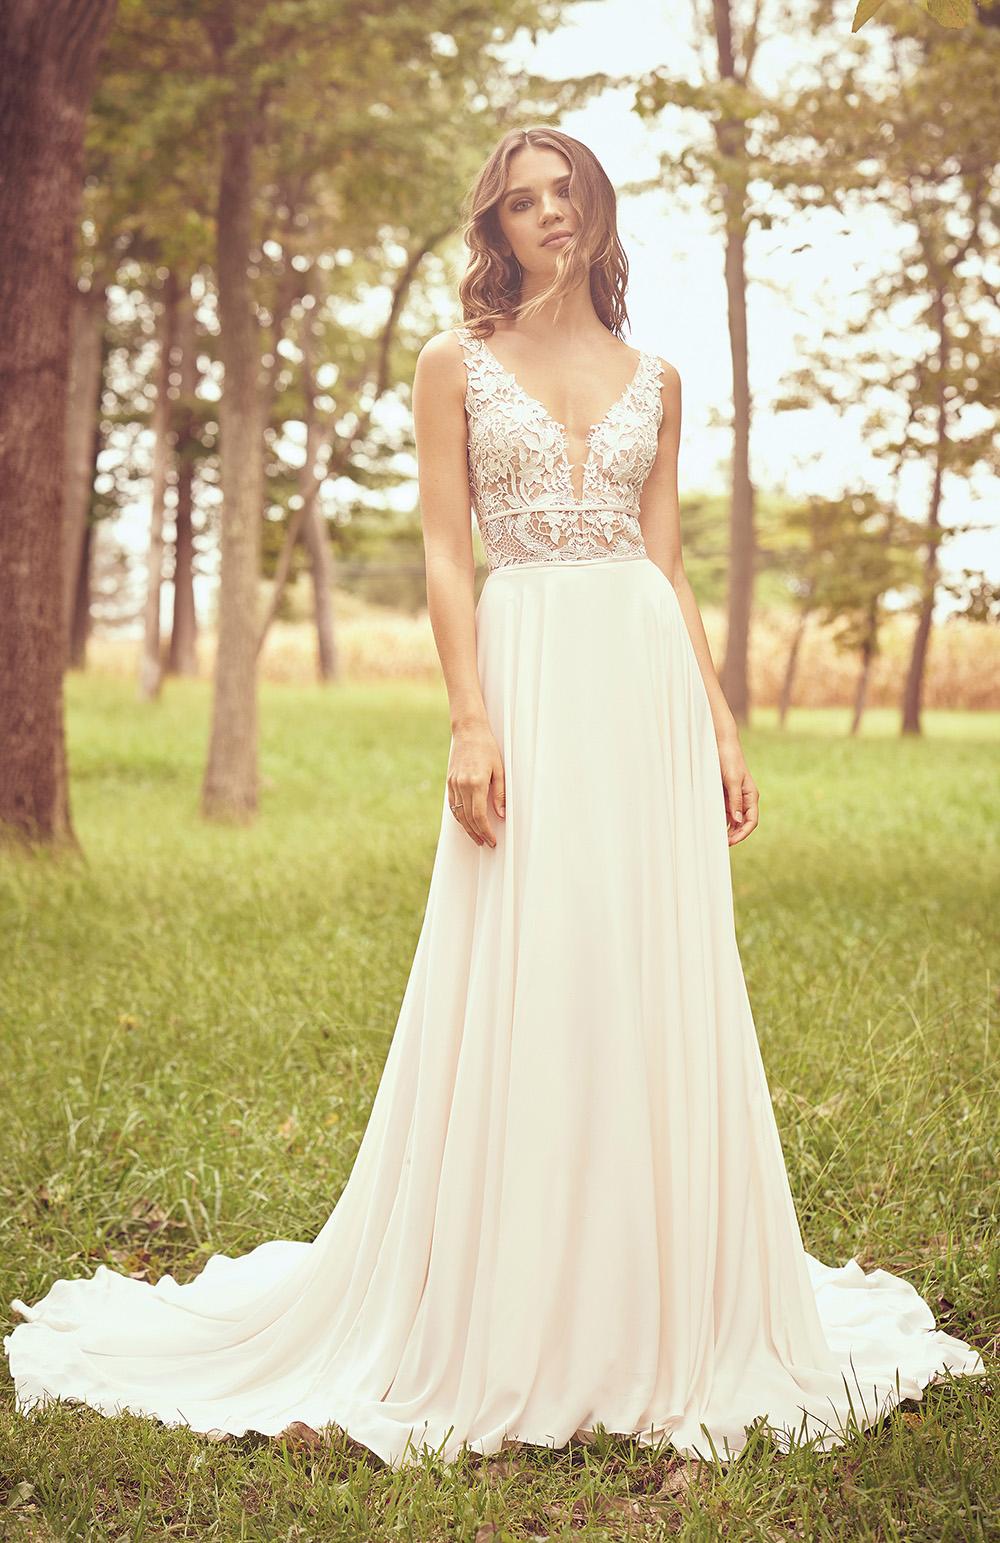 Robe de mariée Modèle Nava